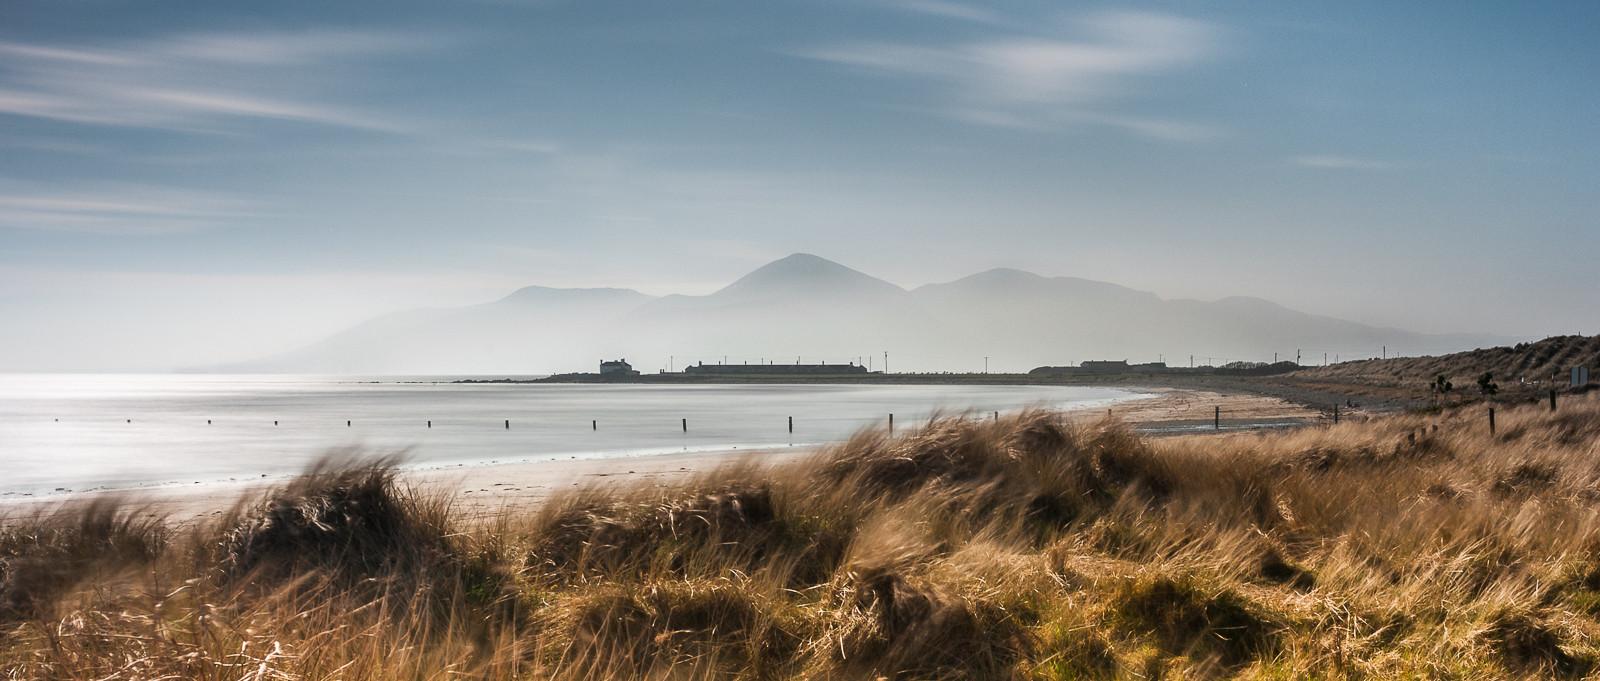 'Beach' by Wayne Hazlett (9 marks)  -  Enniskillen Photographic Society